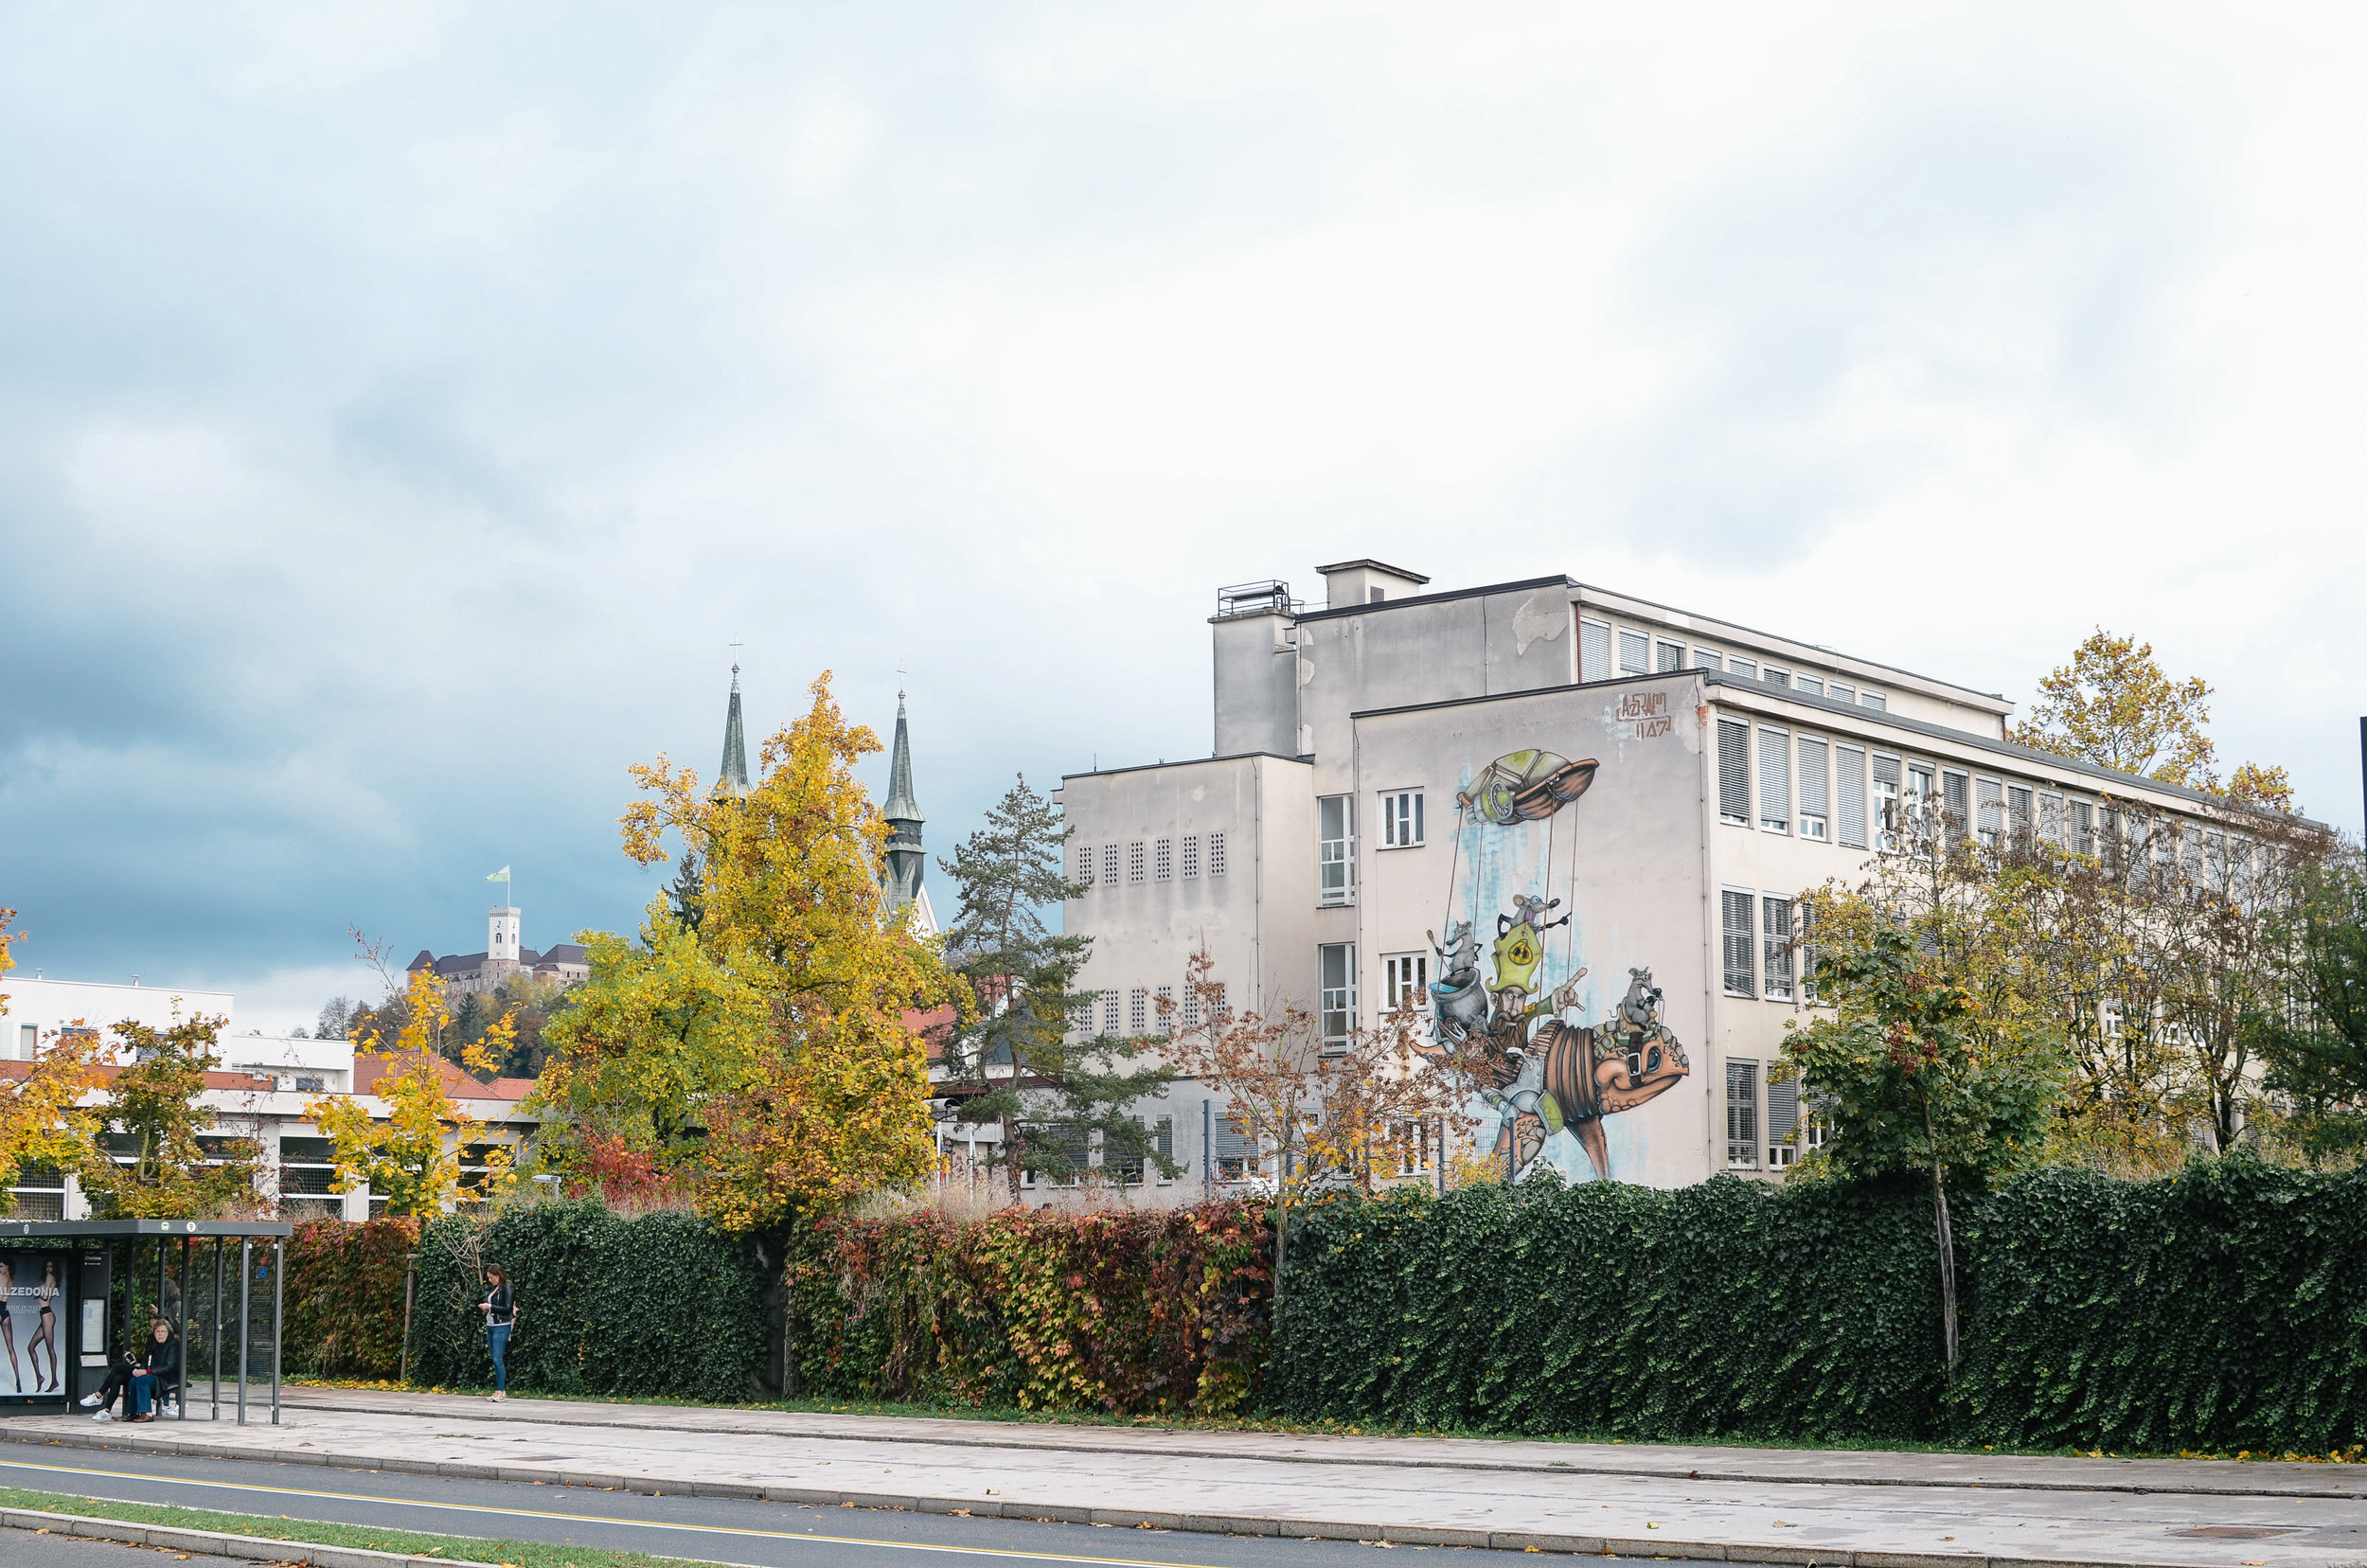 ljubljana-slovenia-travel-guide-lifeonpine_DSC_1730.jpg